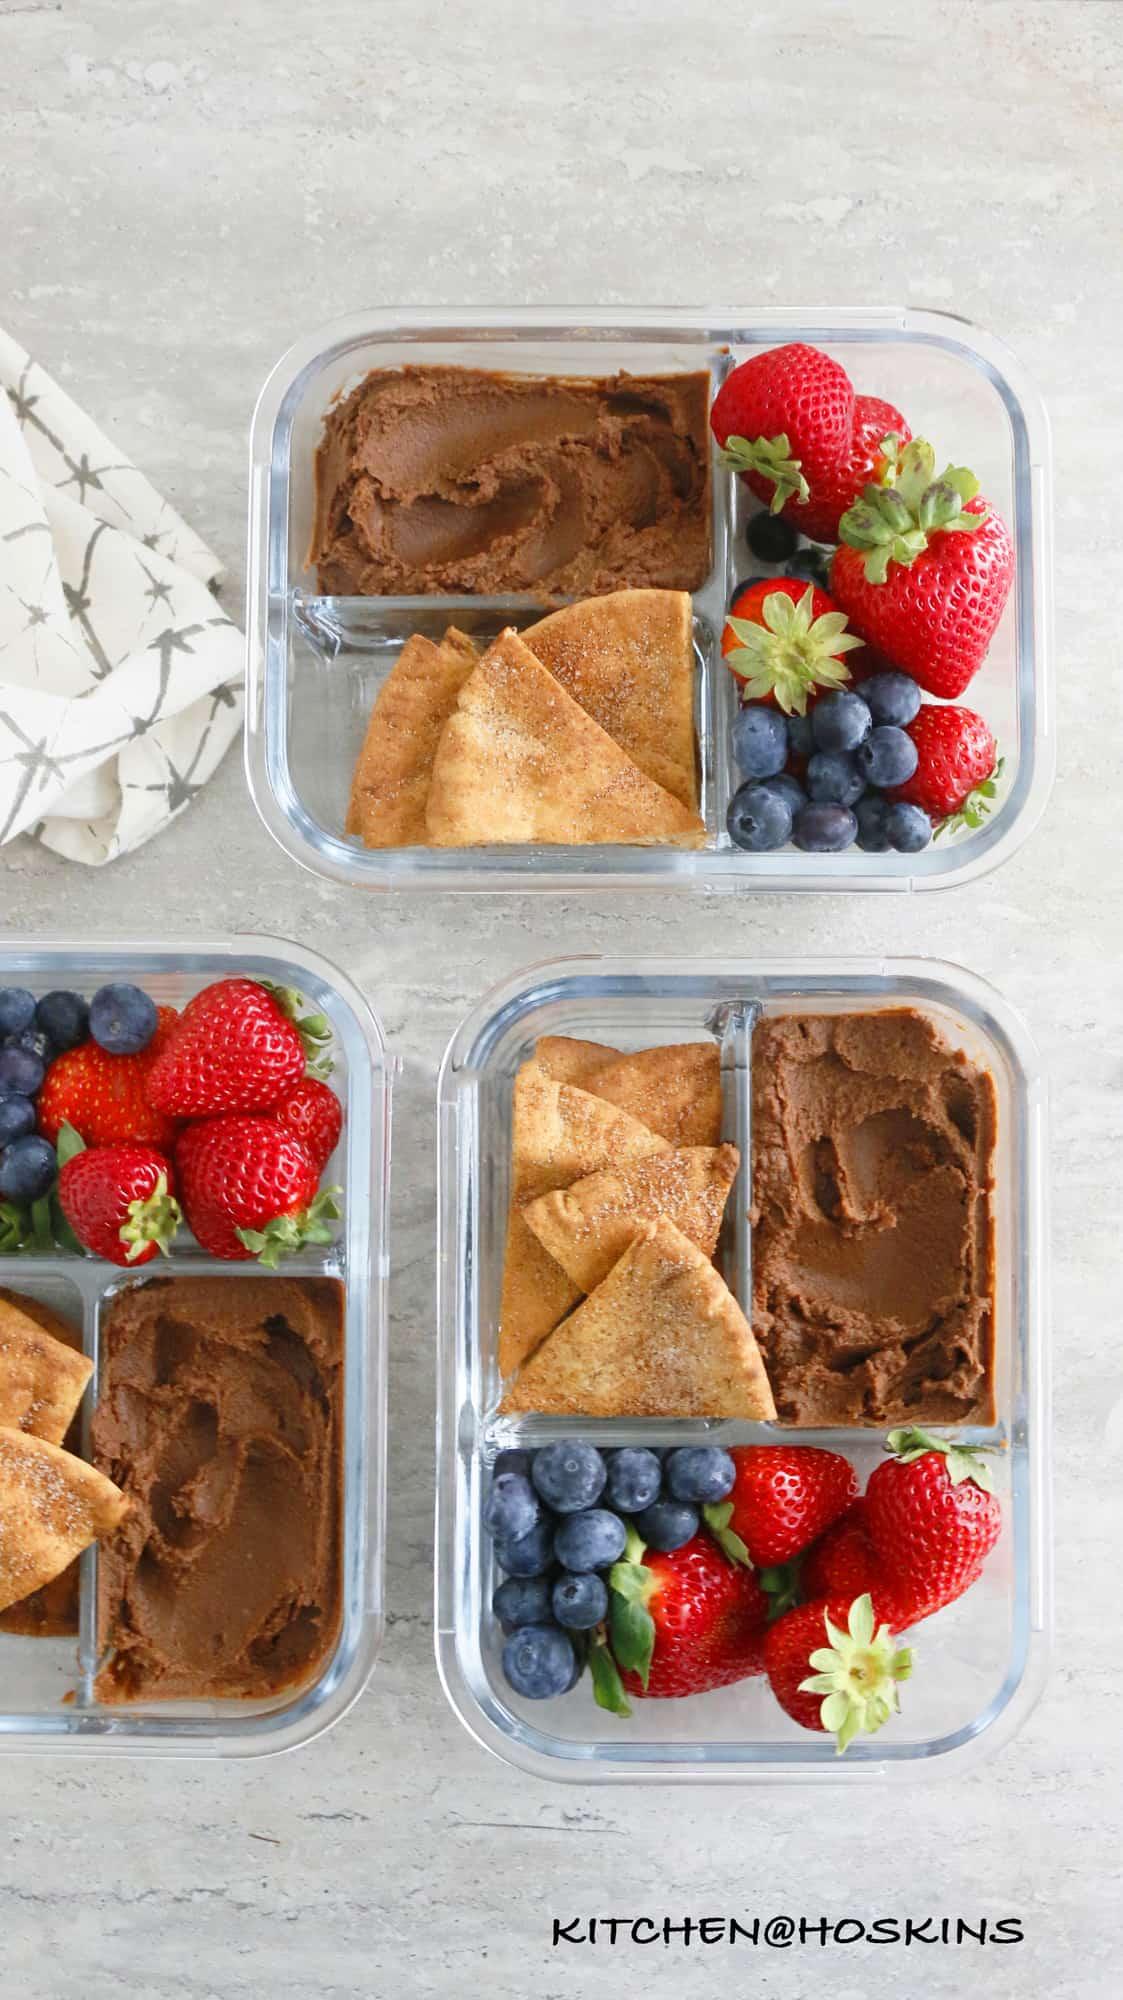 4 INGREDIENT GUILT FREE CHOCOLATE HUMMUS